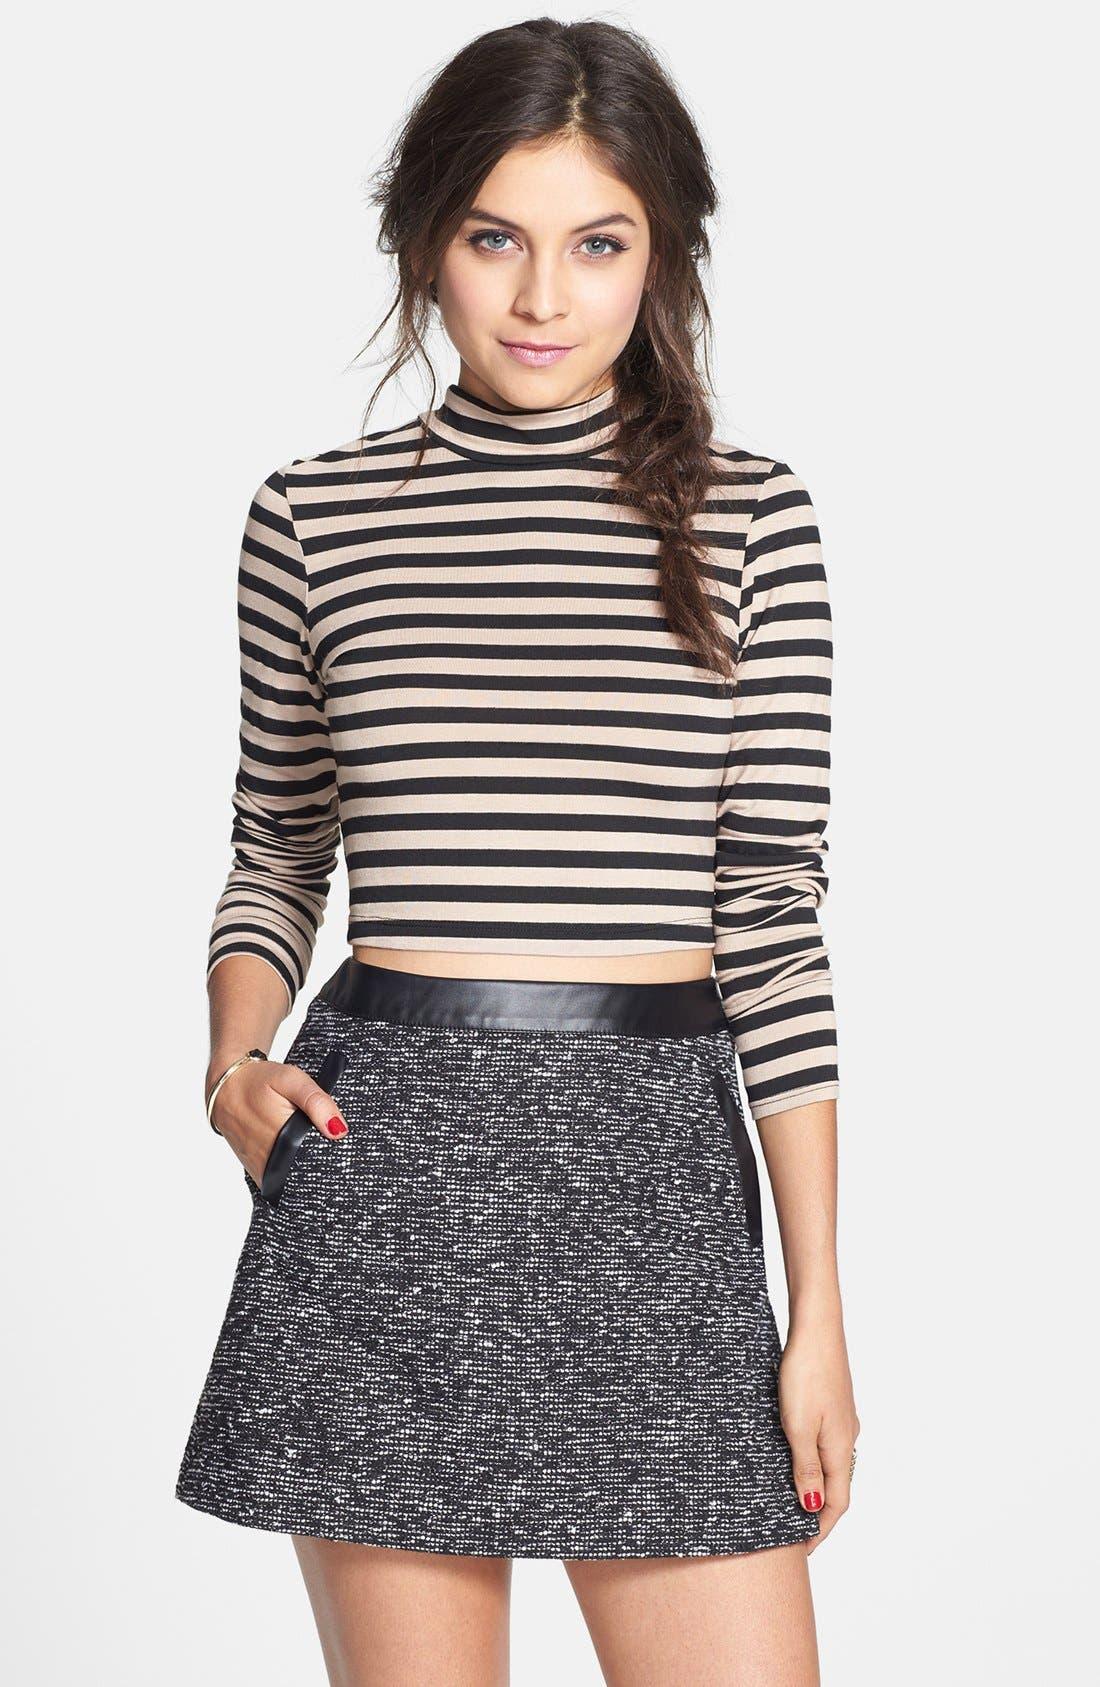 Alternate Image 1 Selected - Frenchi® Faux Leather Trim Miniskirt (Juniors)